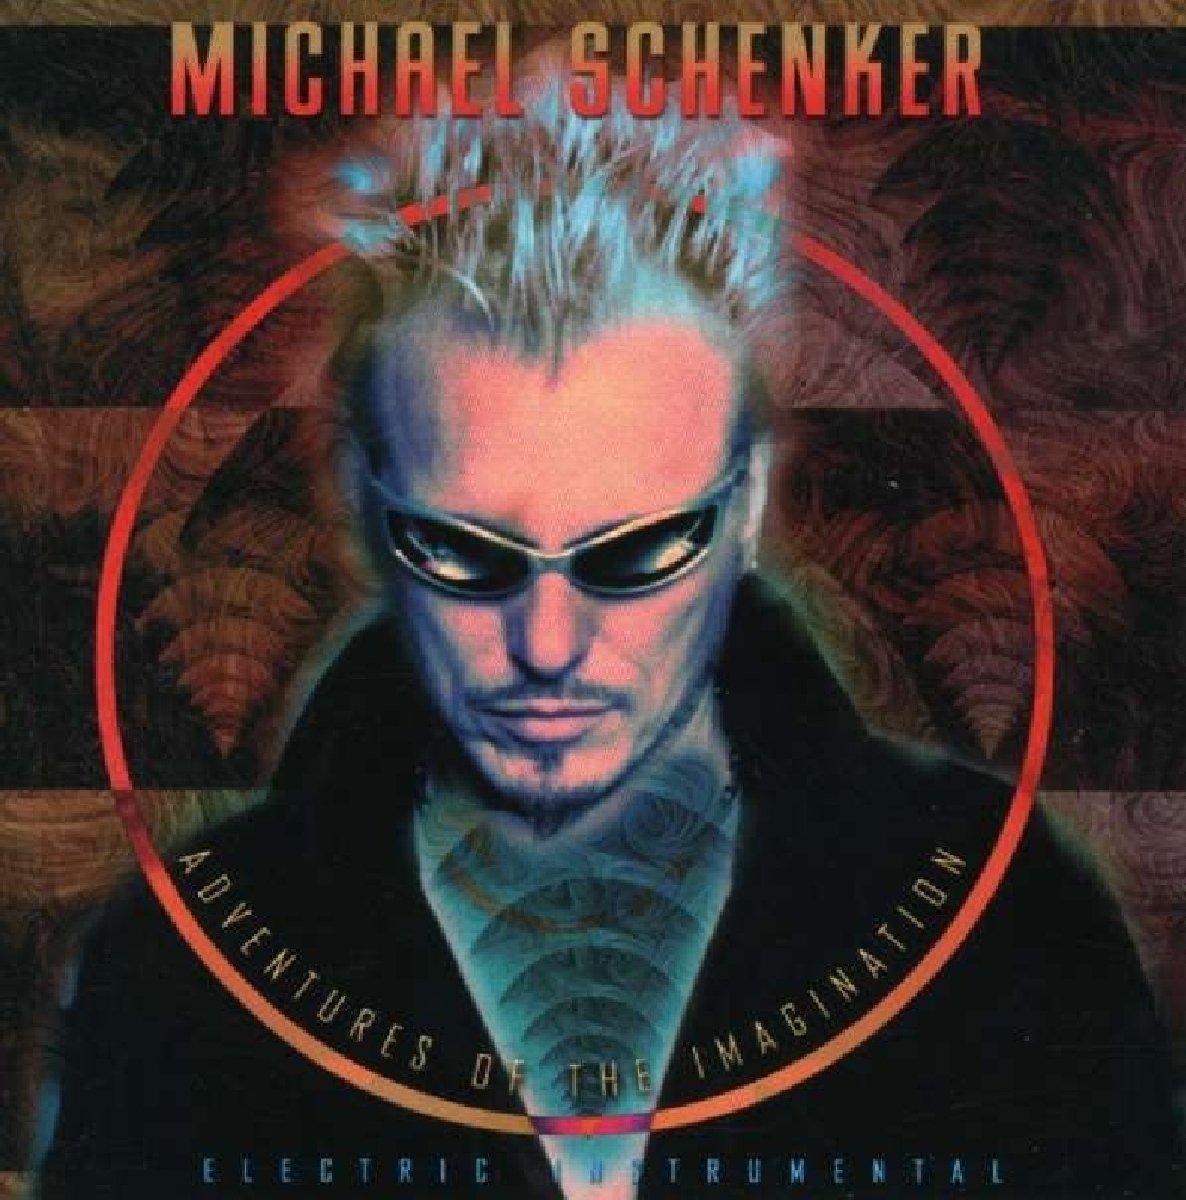 Michael Schenker - ADVENTURES OF THE IMAGINATION - Amazon.com Music